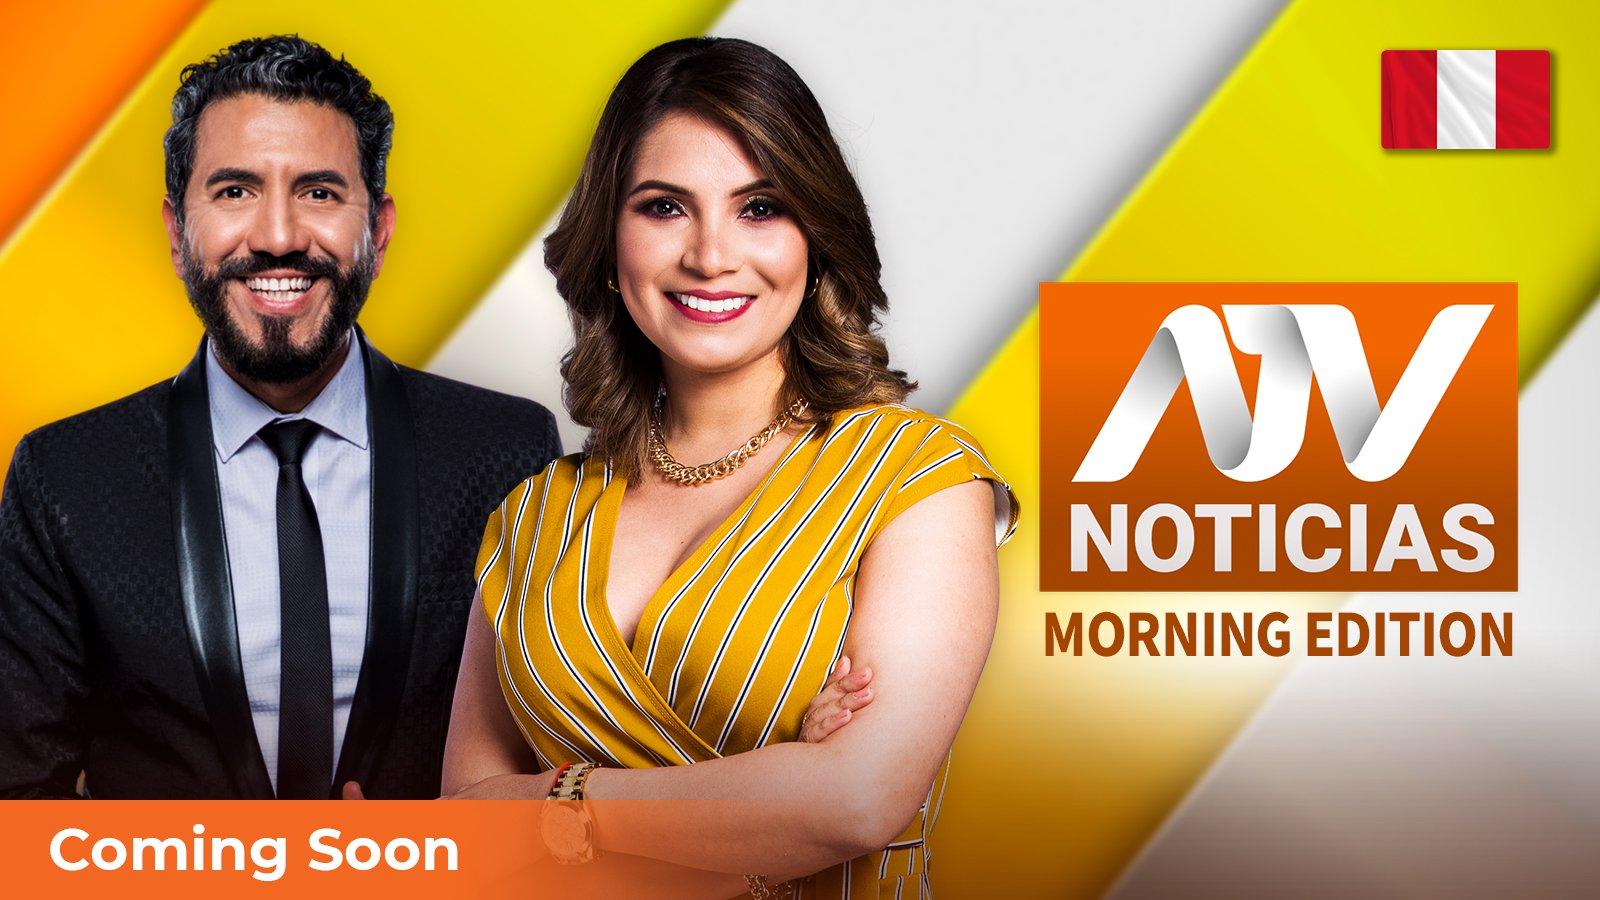 Morning Edition ATV News poster